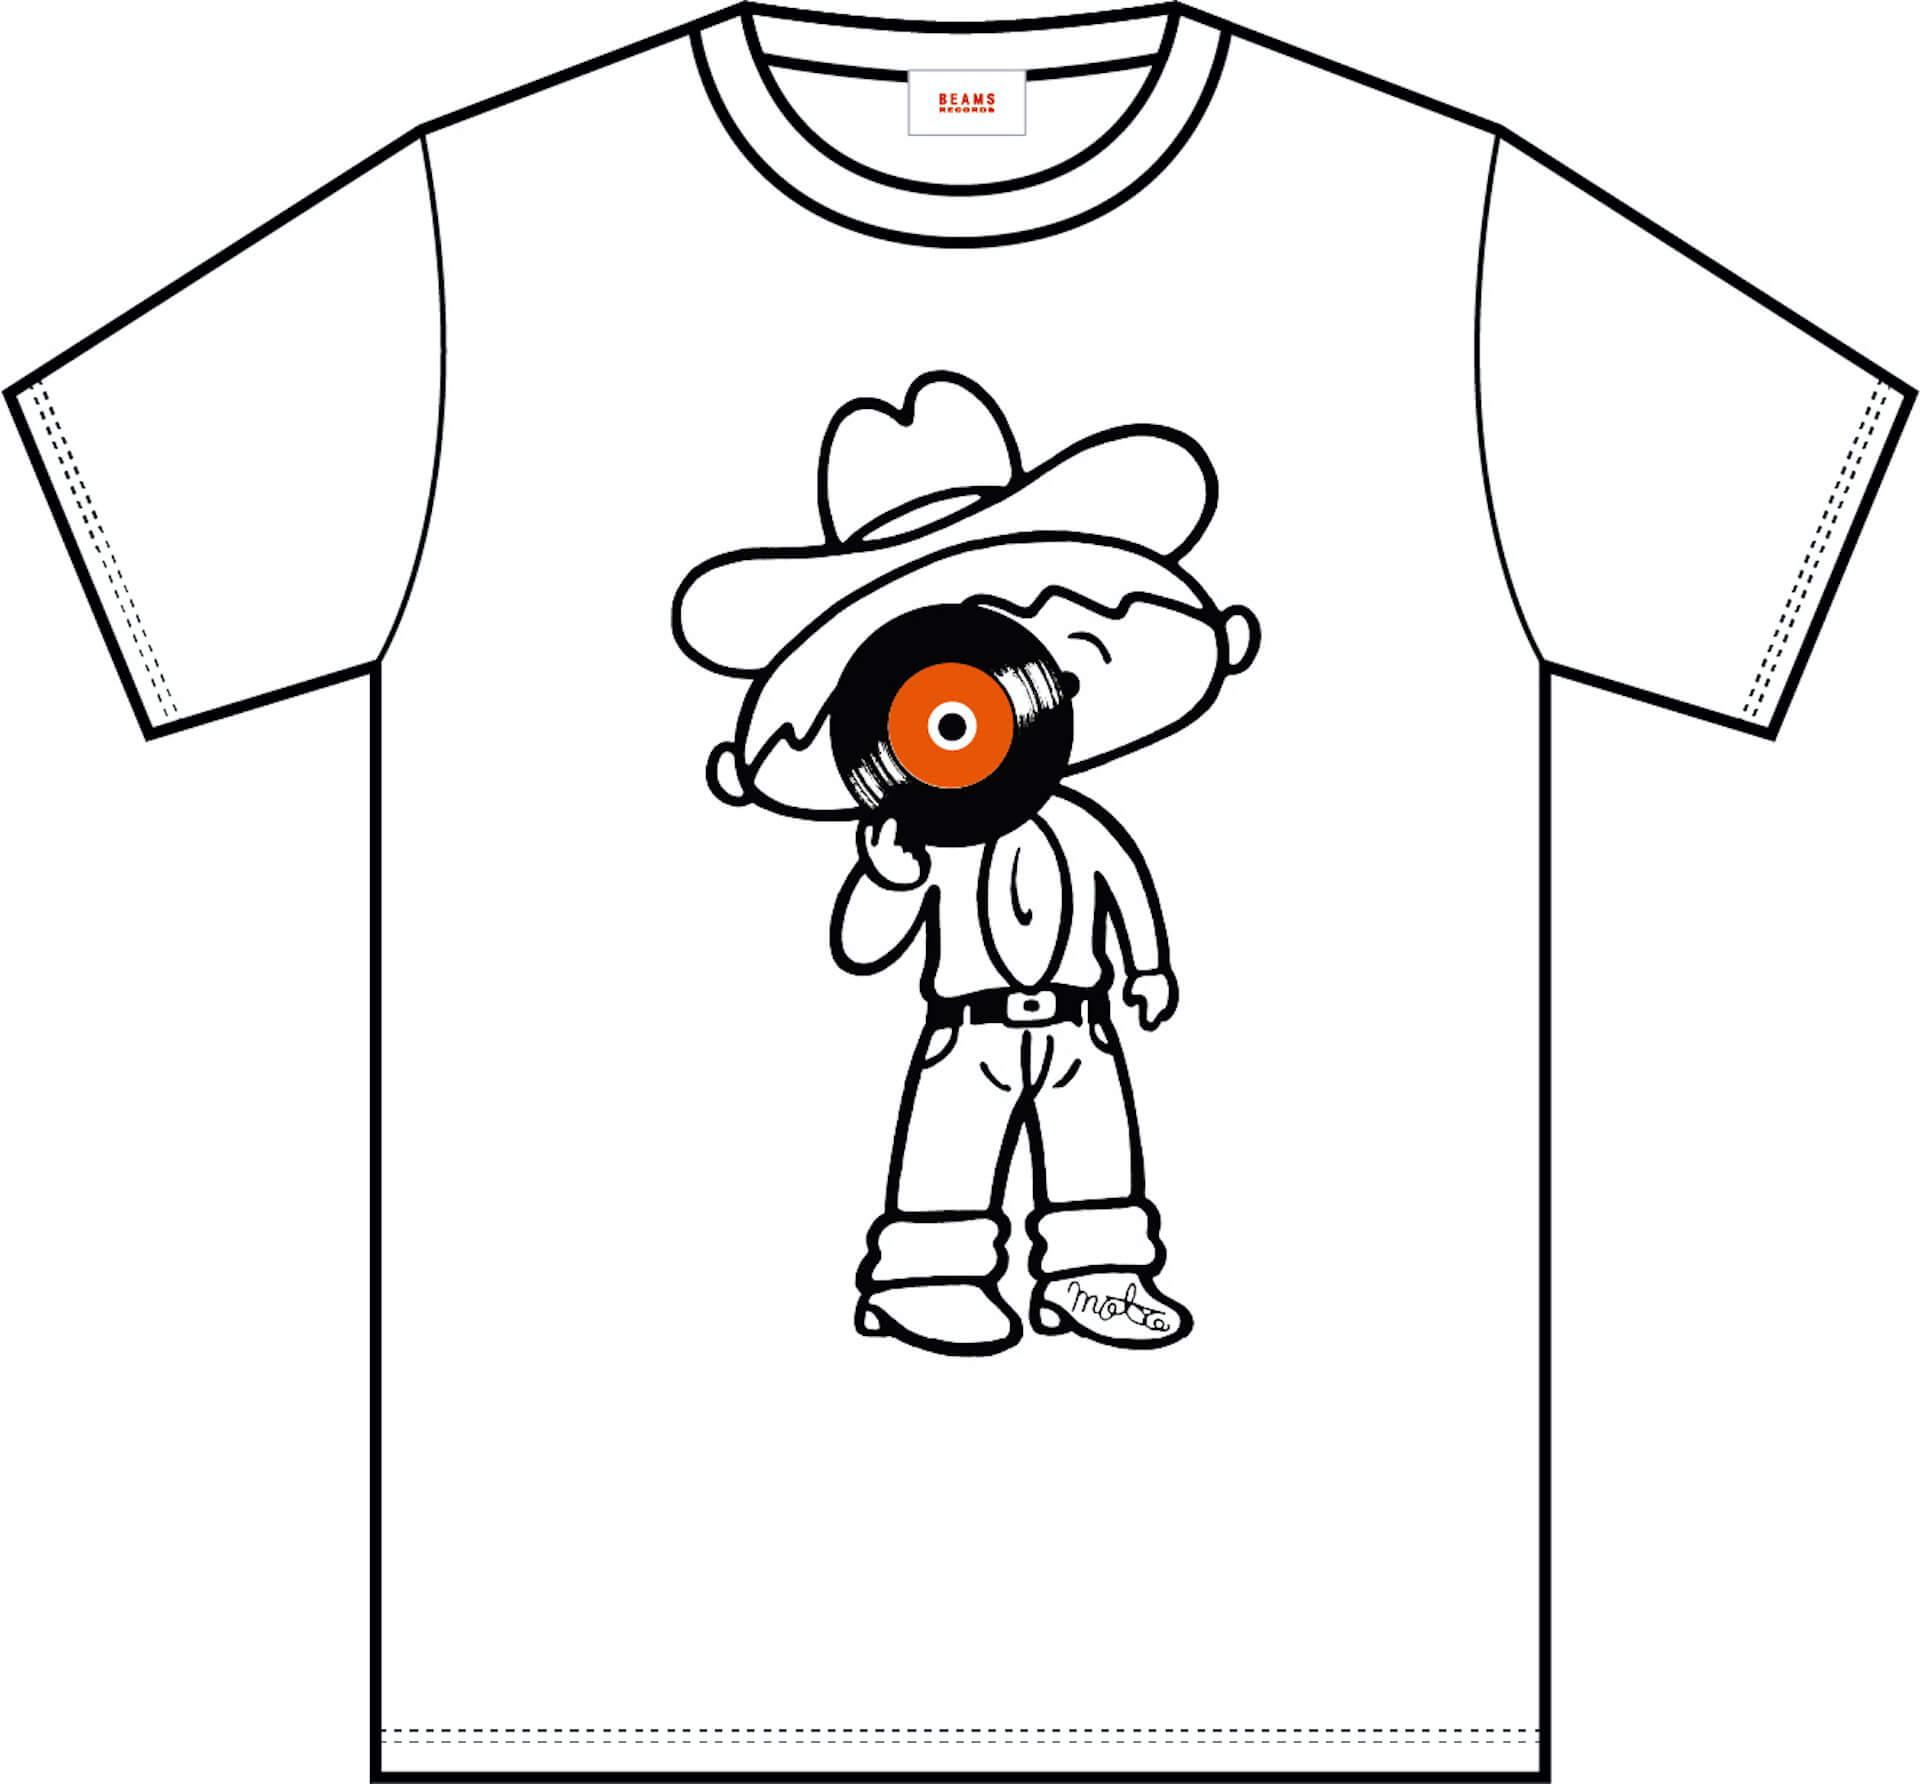 J-WAVE × BEAMS RECORDSのTシャツ第2弾が受注販売開始!本秀康、cherry chill will、TOWA TEIらが参加 music200612_jwave_beamsrecords_01